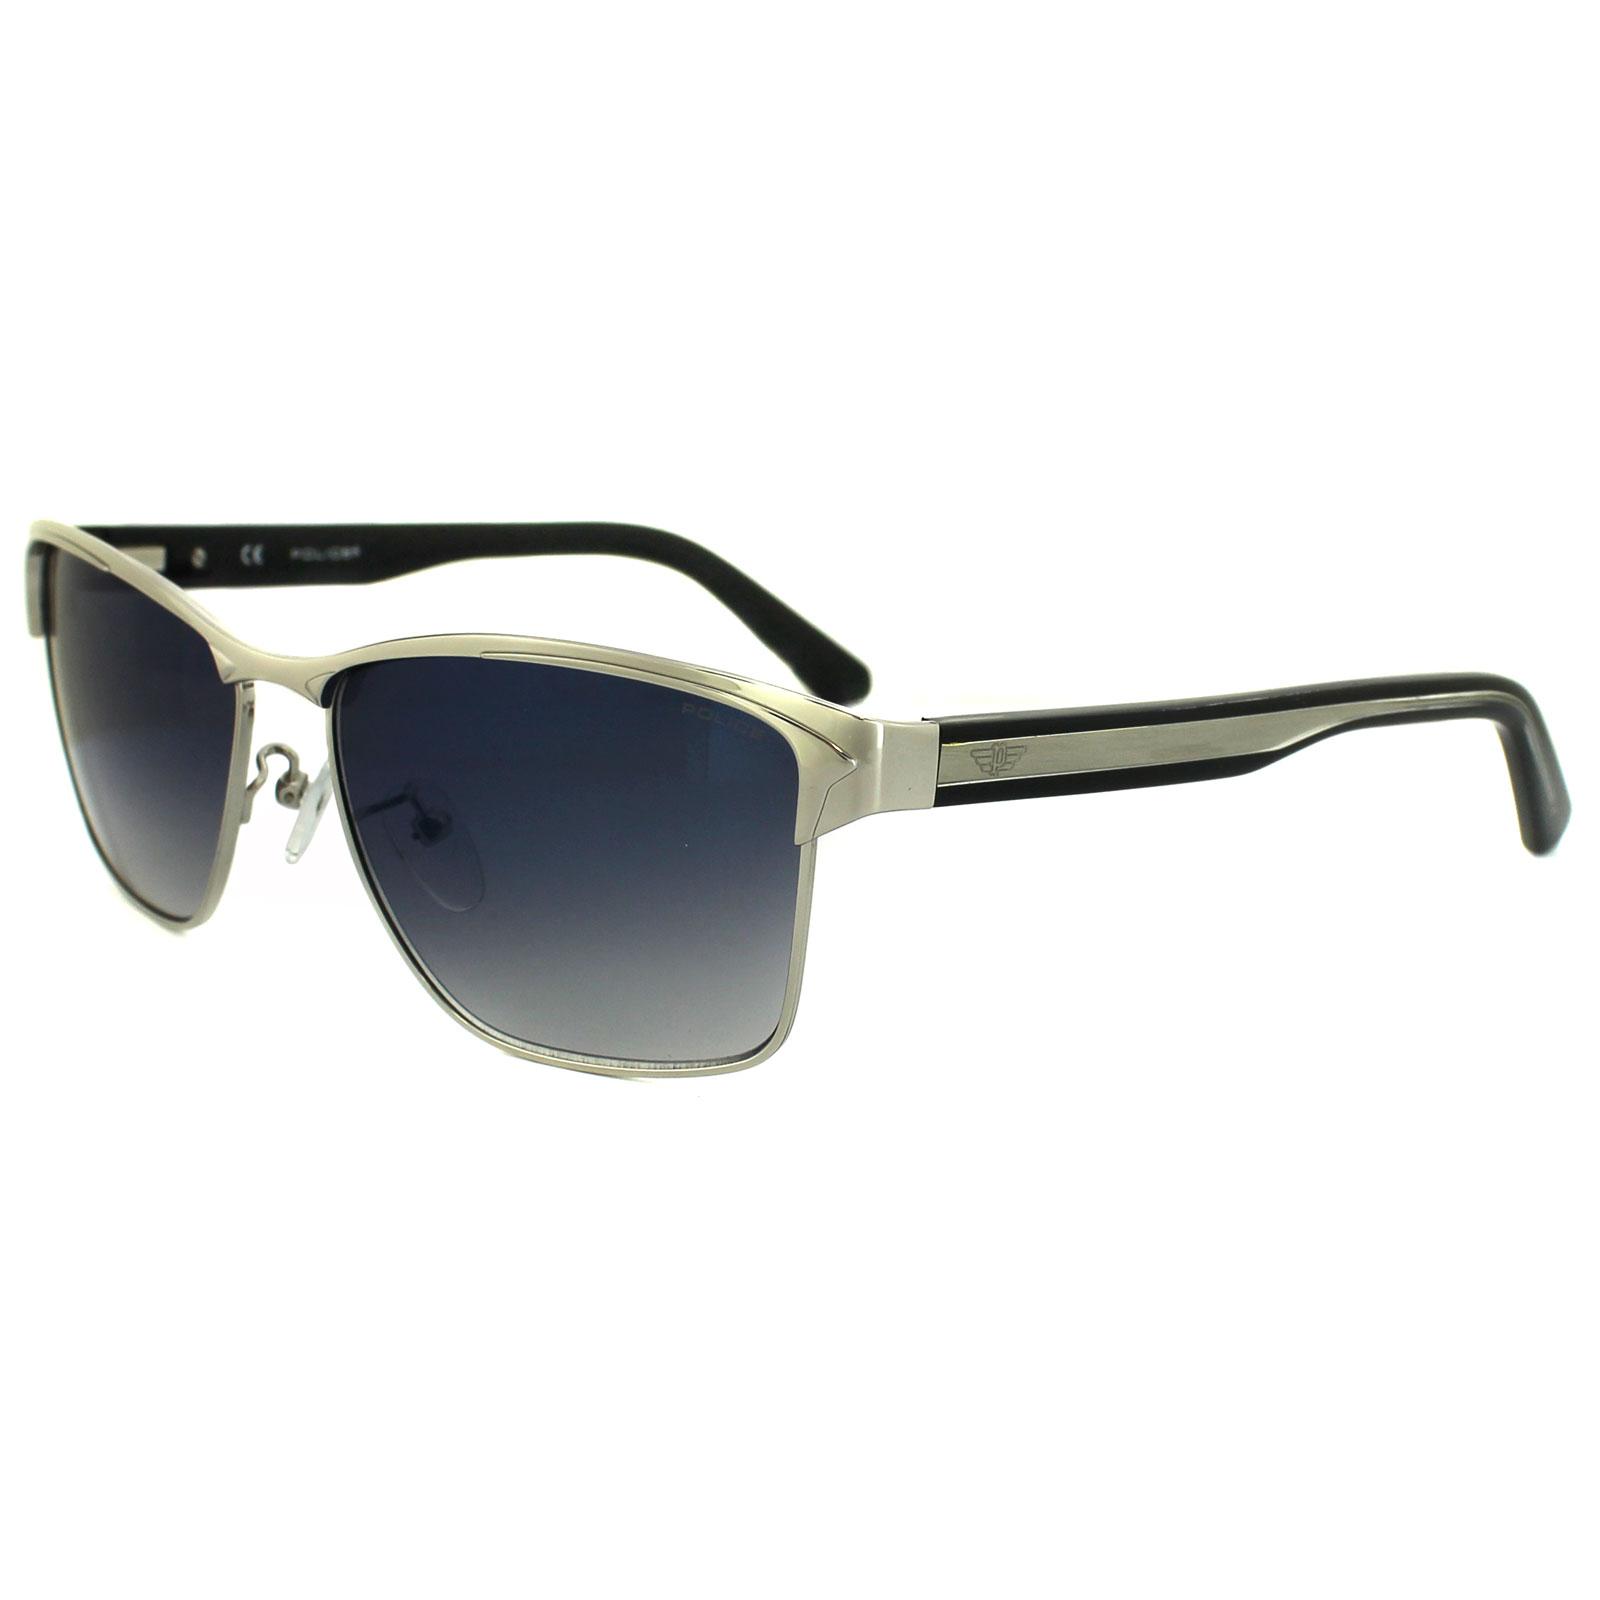 45d056a45cd Police Sunglasses Glider 2 8851 579B Palladium   Black Blue Mirror Gradient  Thumbnail ...